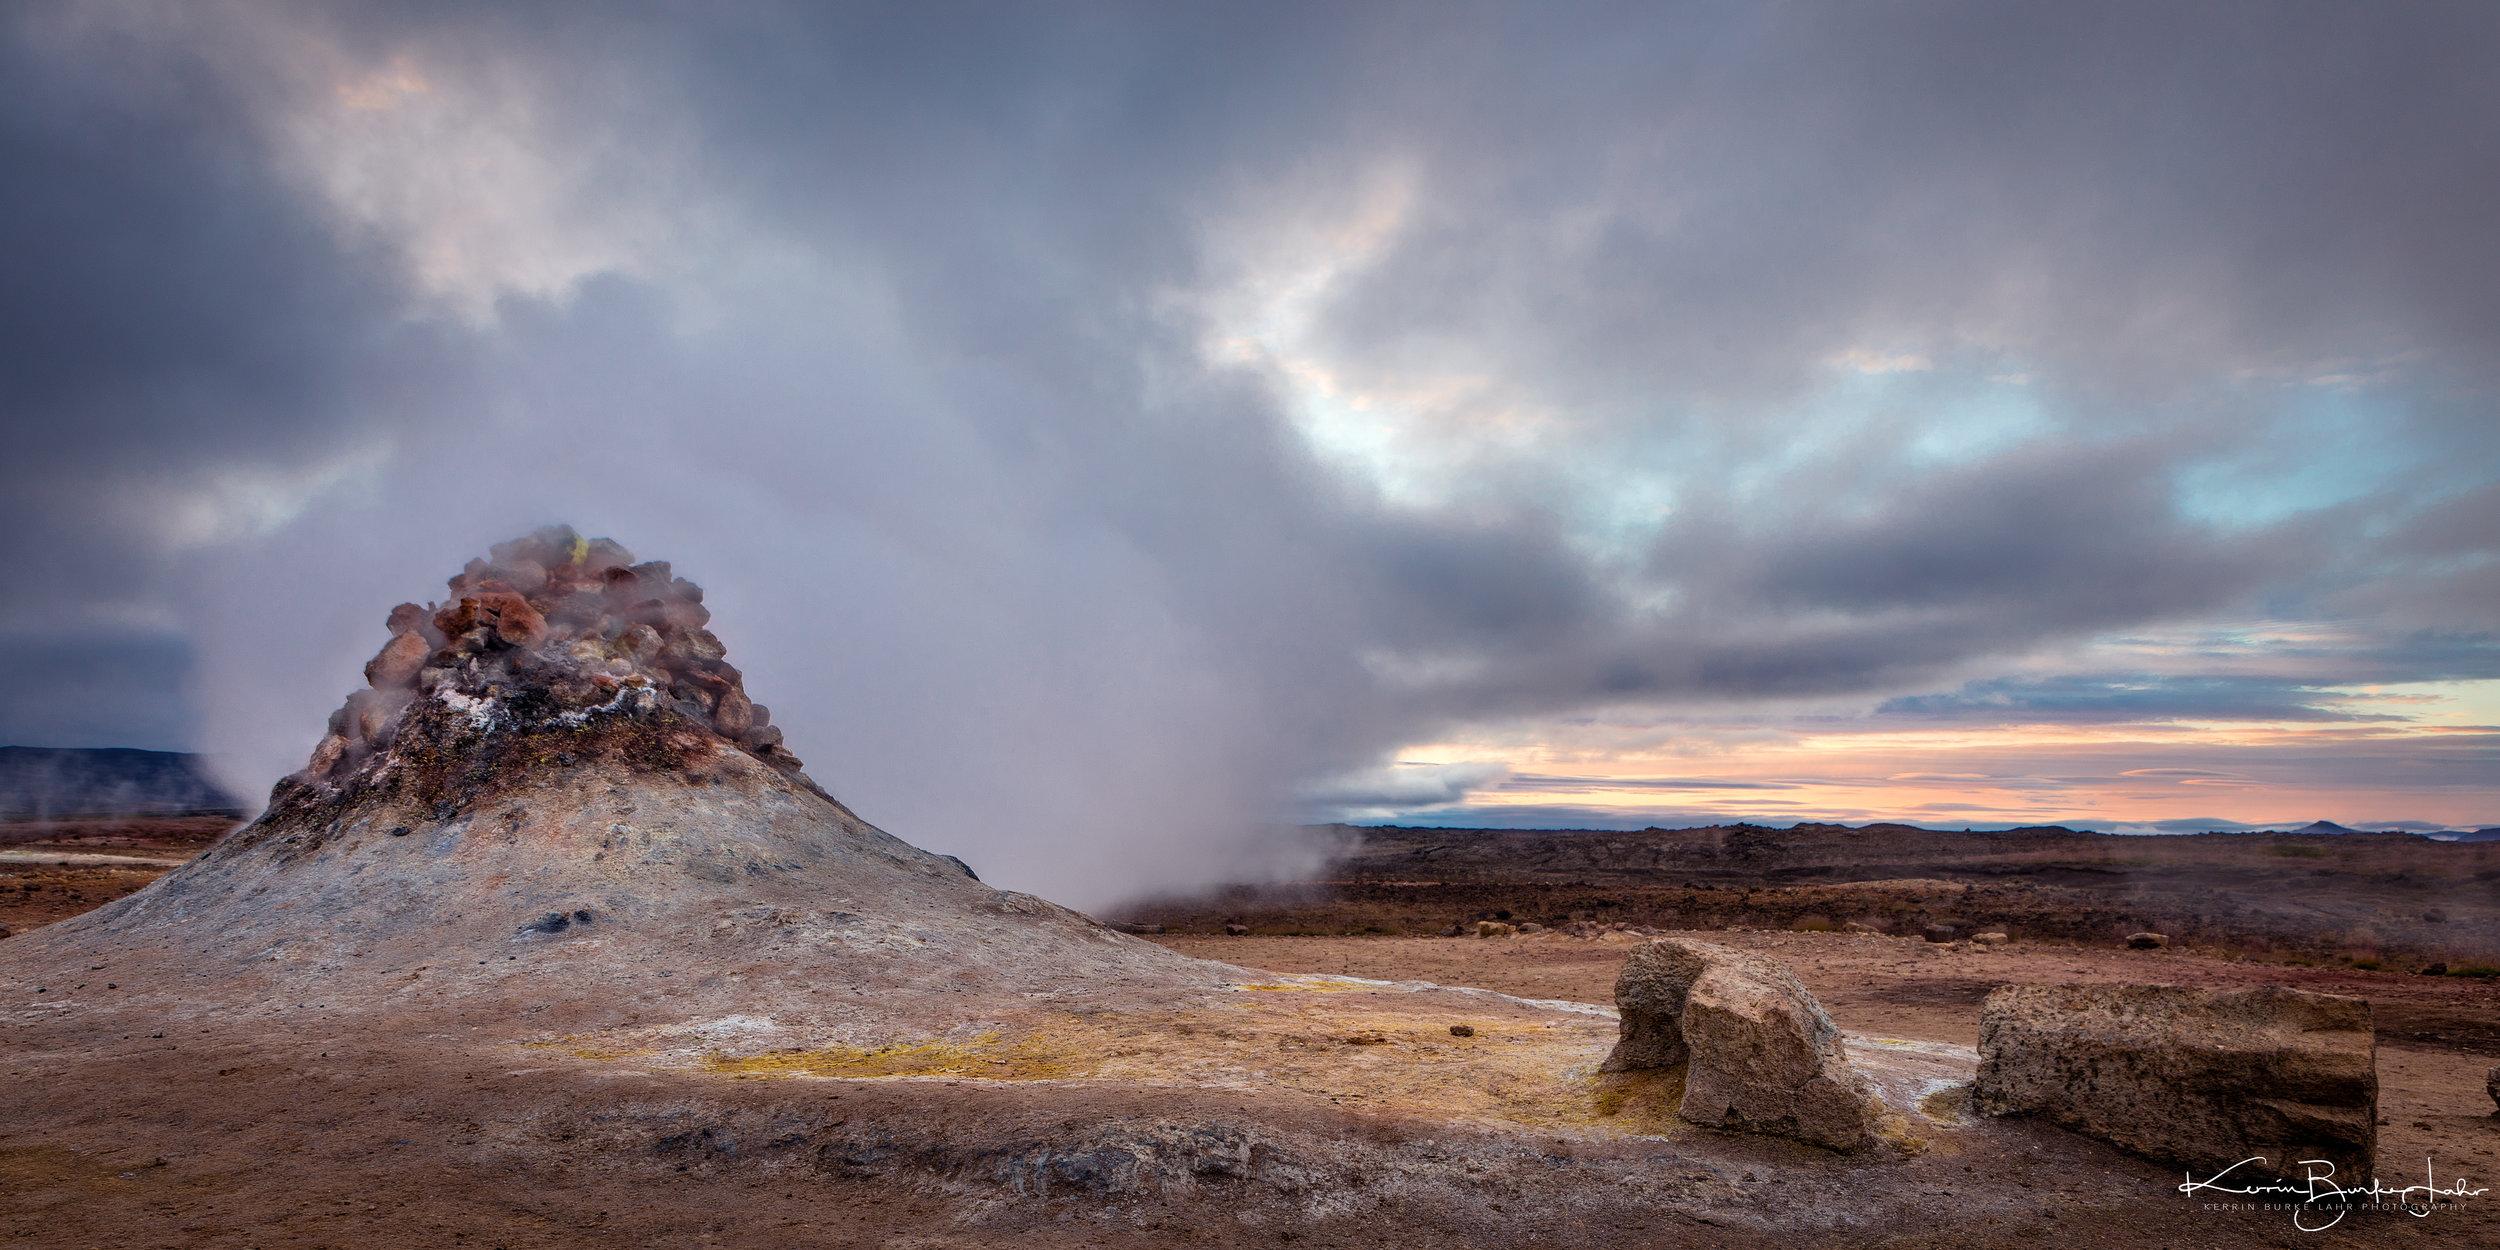 Iceland-Day-4-afternoon-2-Edit.jpg